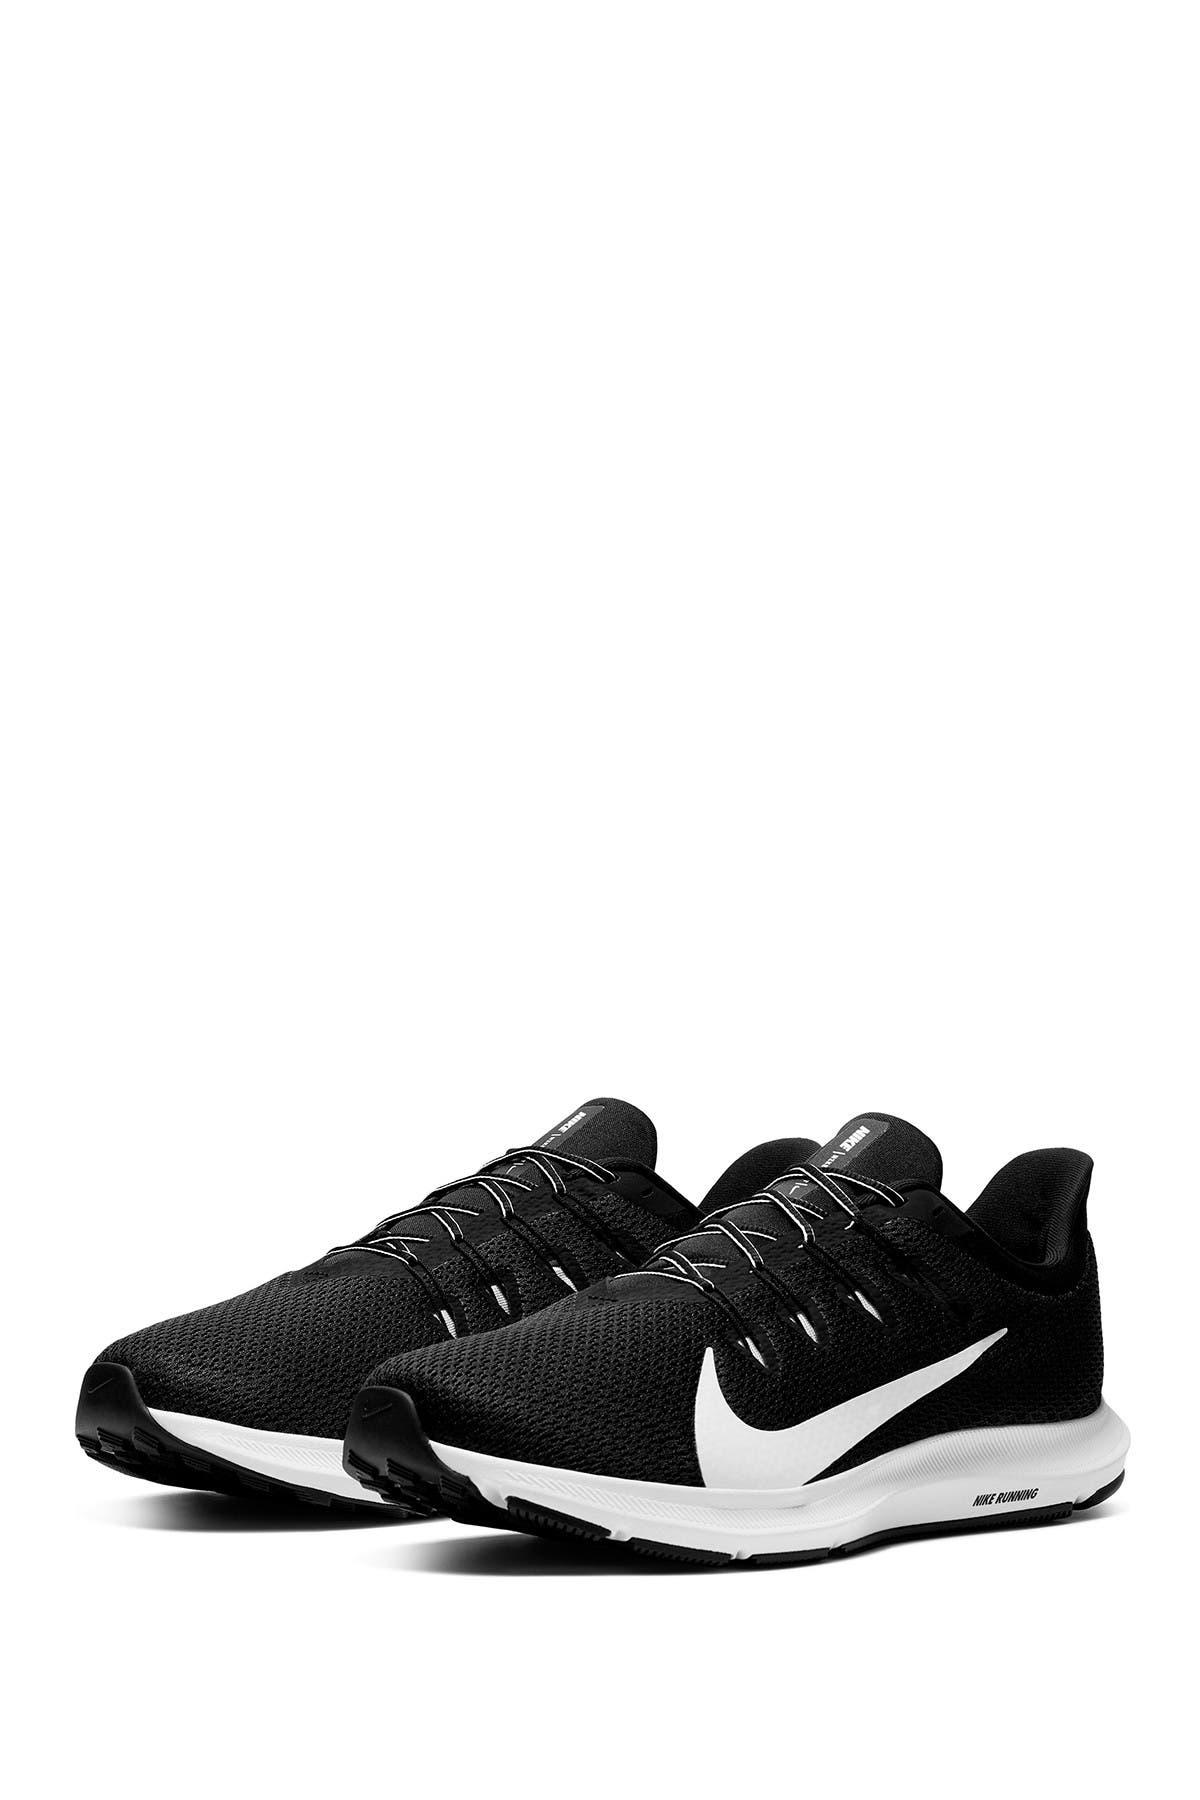 Nike   Quest 2 Running Shoe - Extra Wide Width   Nordstrom Rack